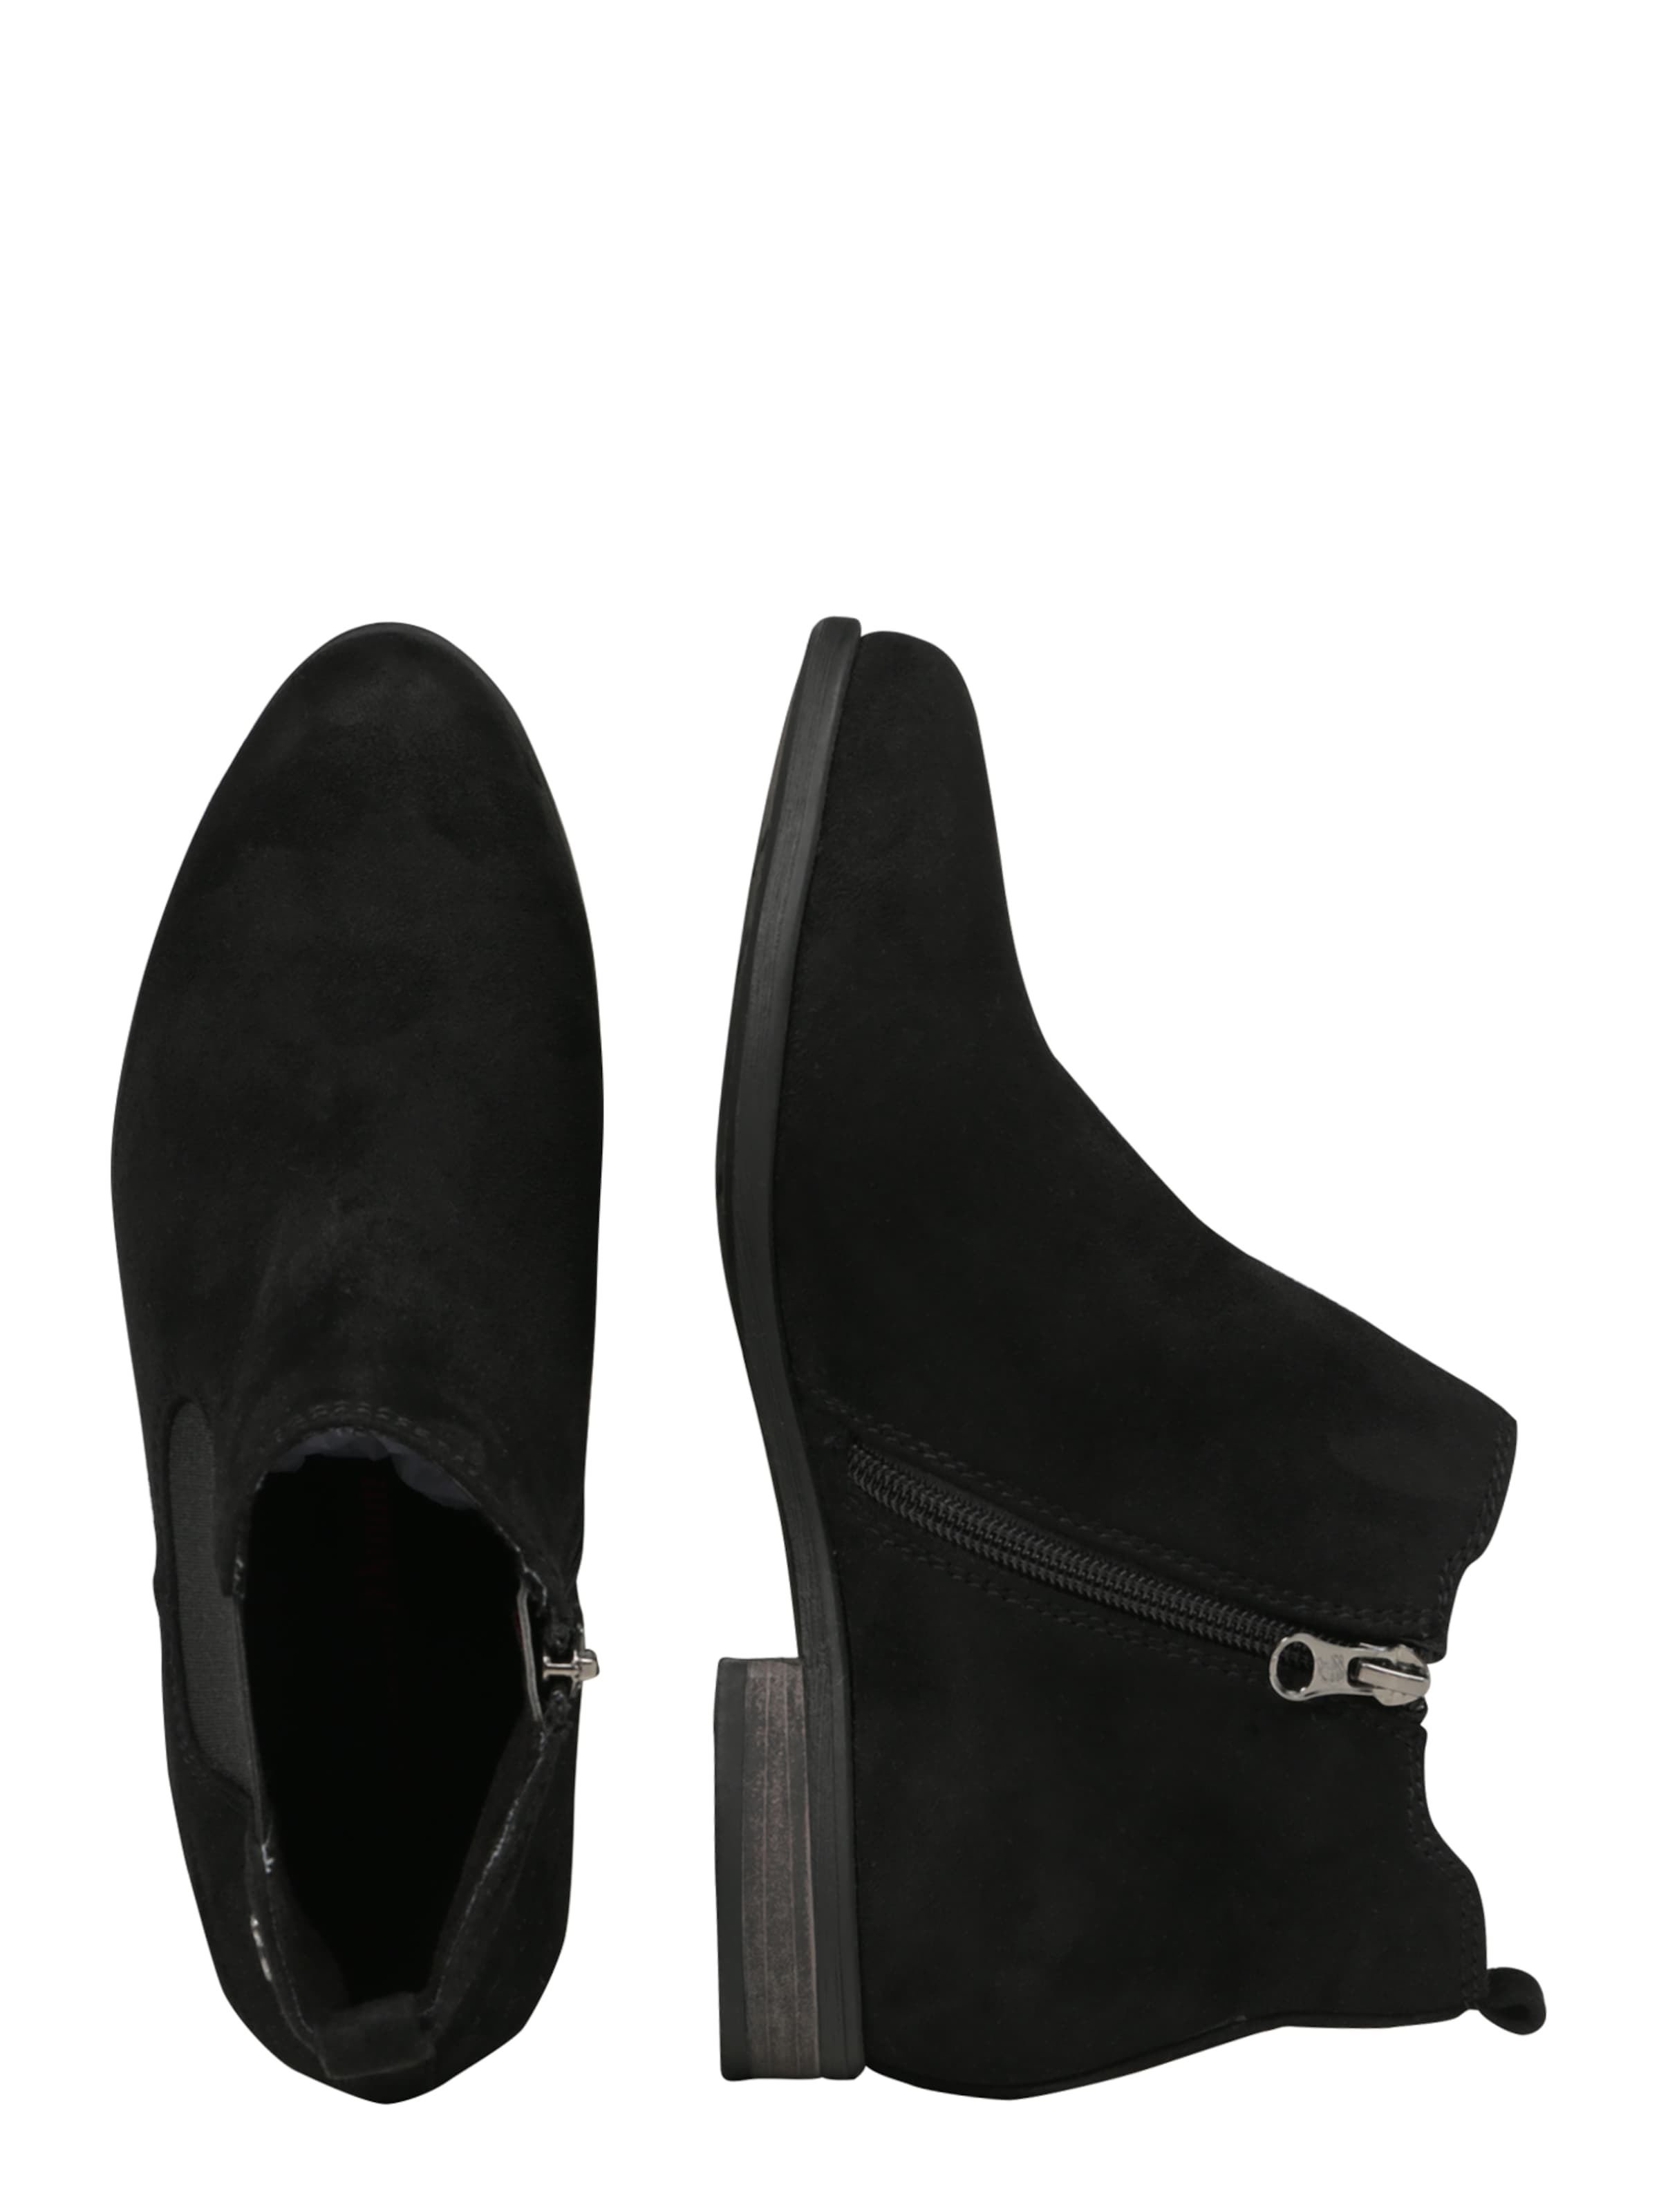 Chelsea Boots Noir En Tom Tailor yIf7vYb6g